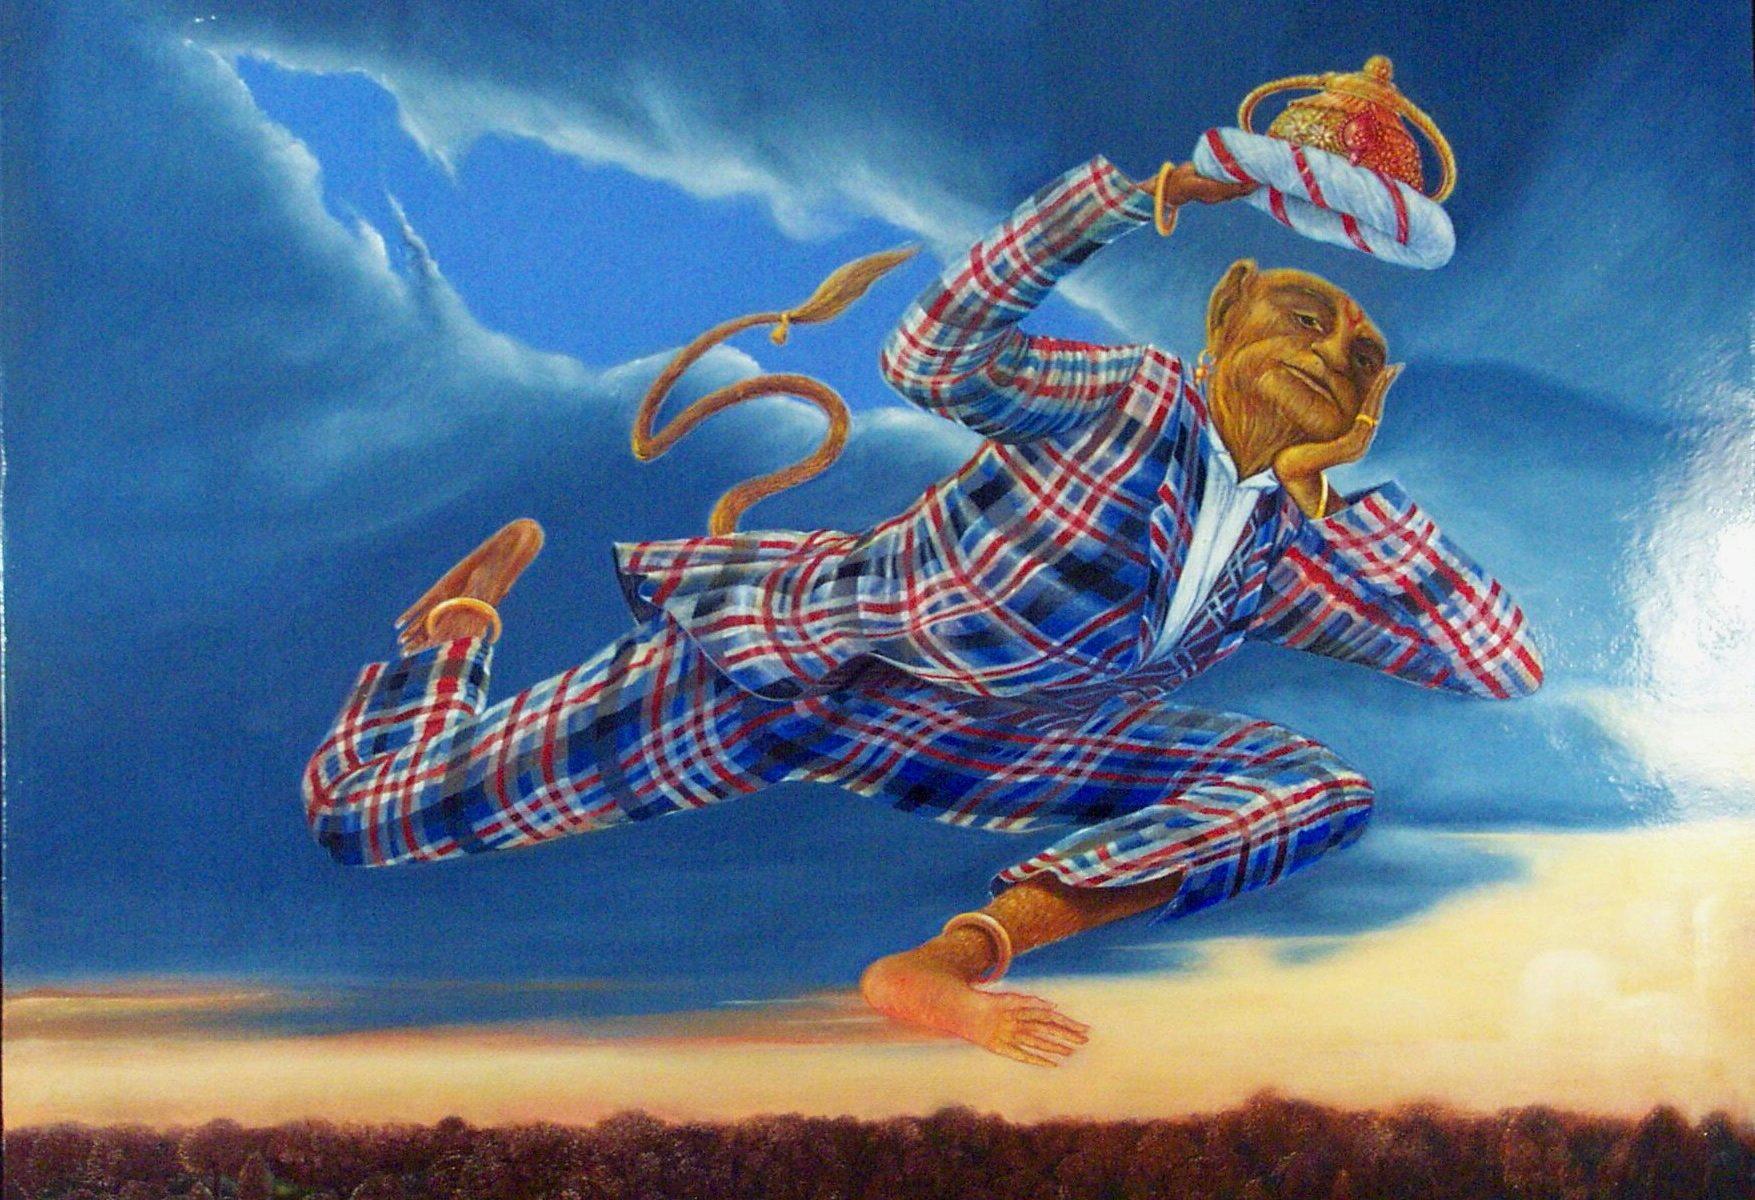 flying hanuman by Hans Diebschlag